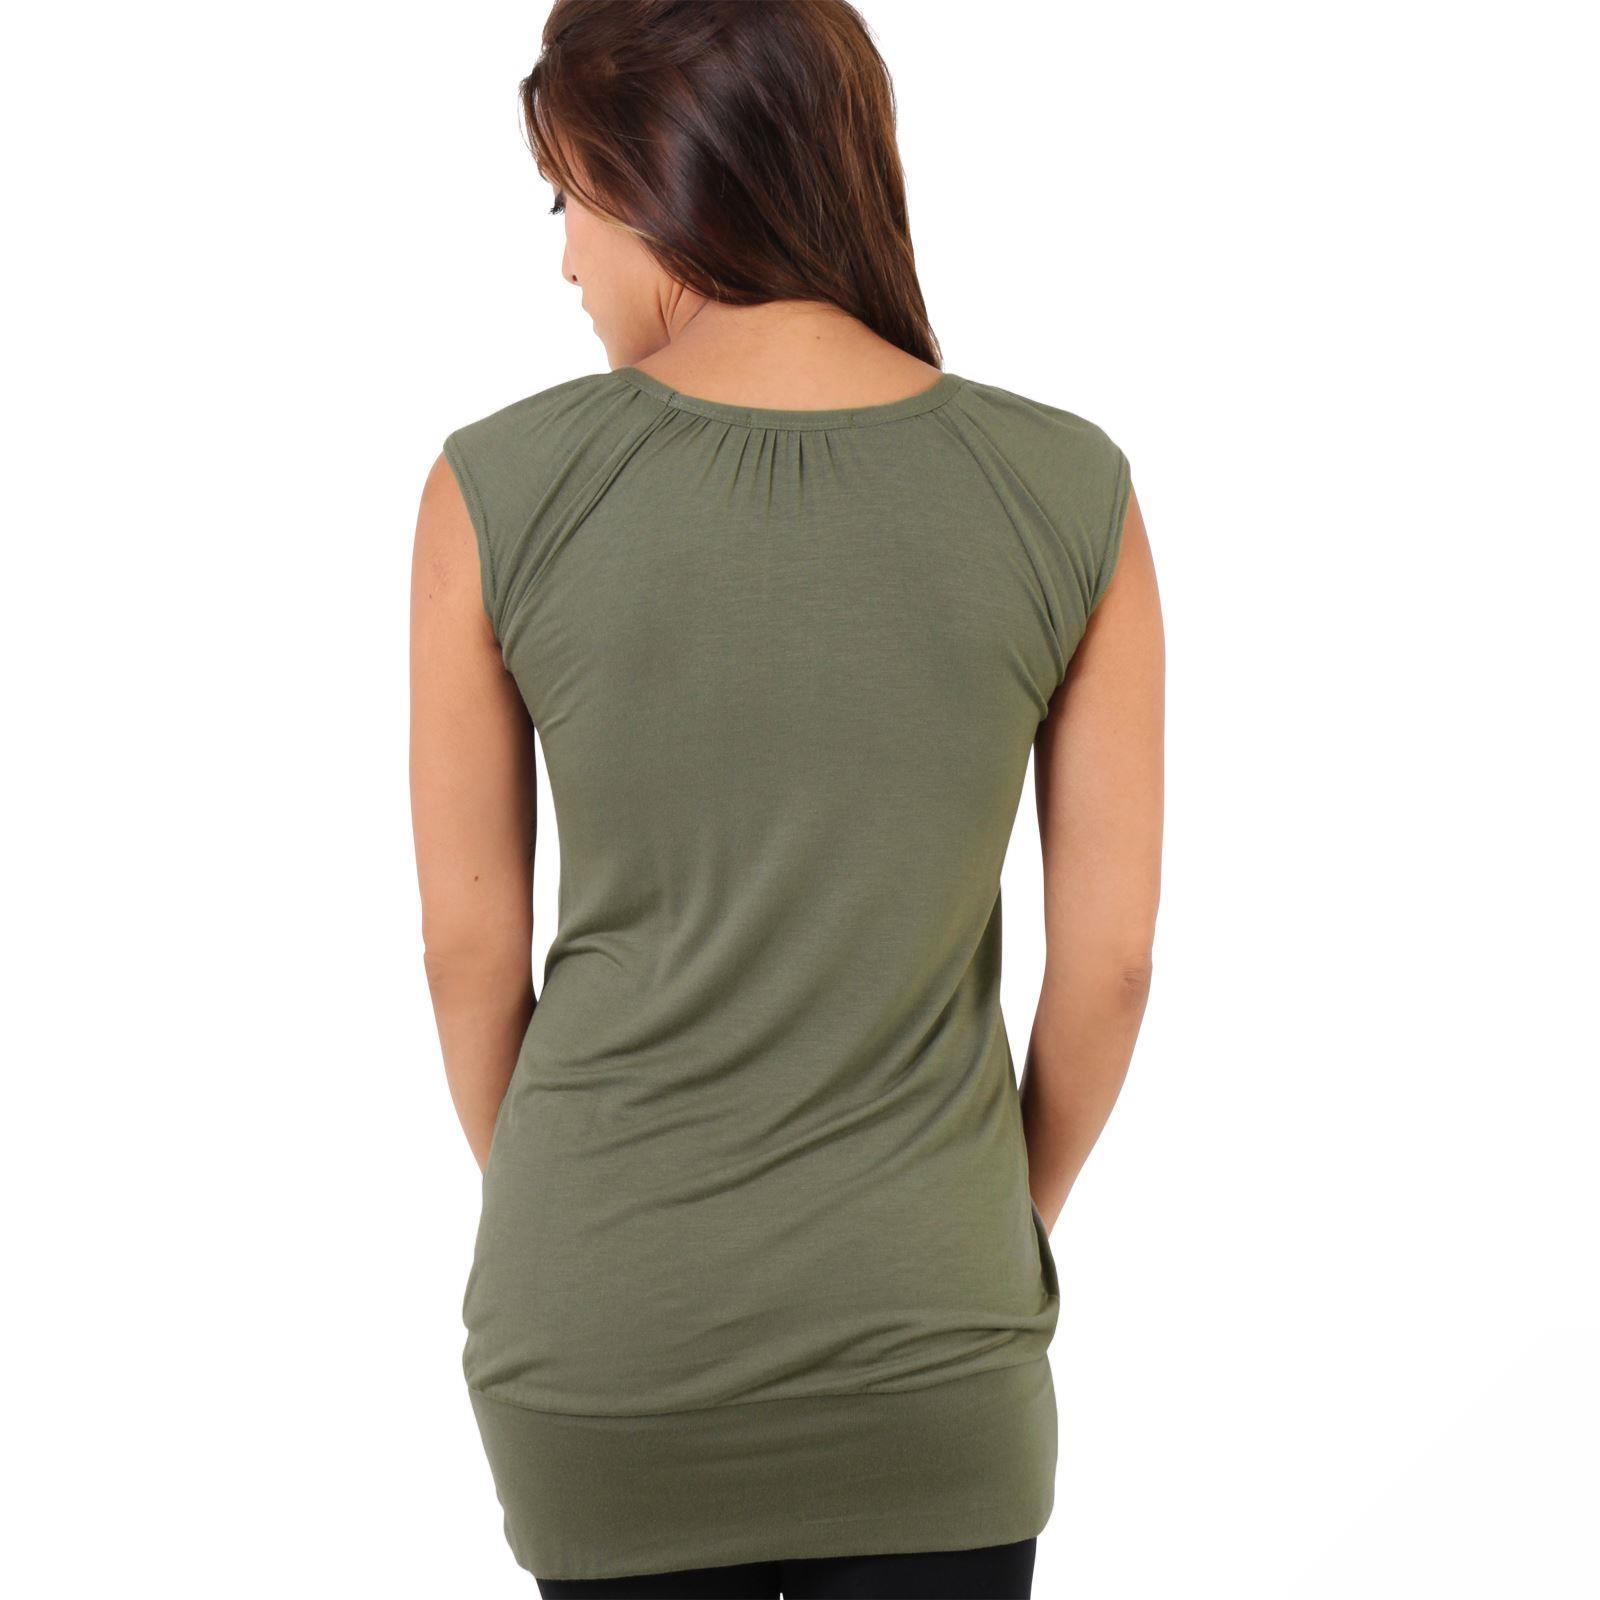 Womens-Ladies-Scoop-Neck-Blouse-V-T-Shirt-Long-Short-Sleeve-Plain-Loose-Top thumbnail 26